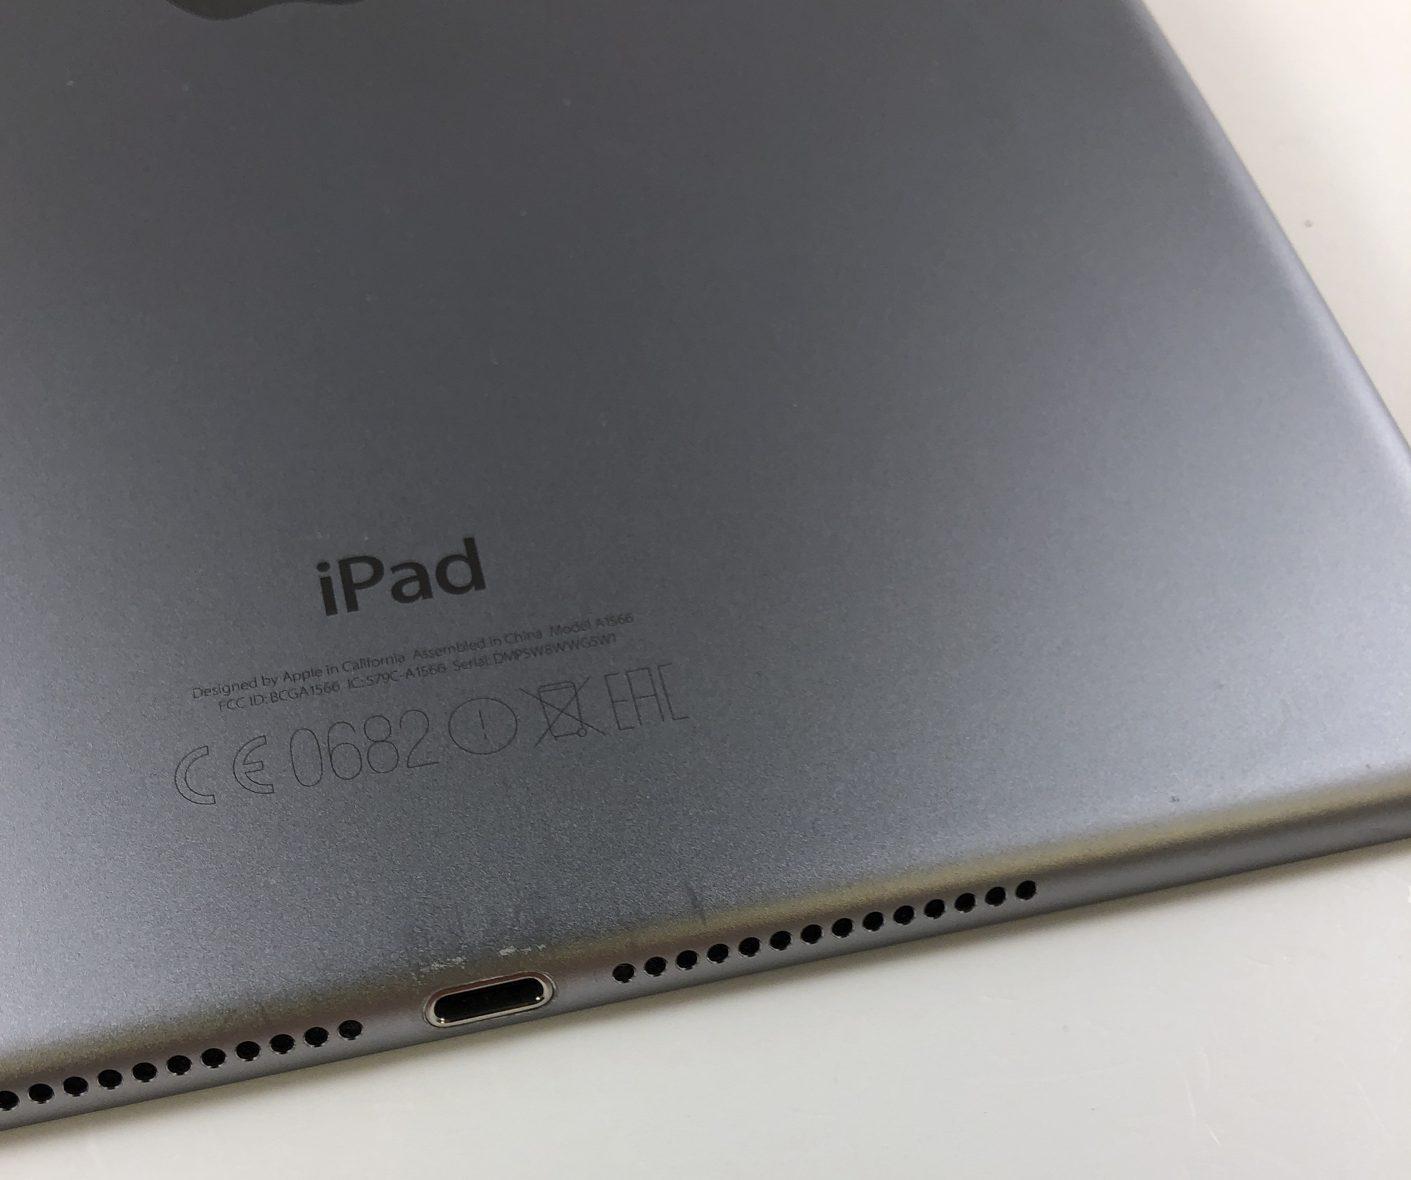 iPad Air 2 Wi-Fi 128GB, 128GB, Space Gray, immagine 4